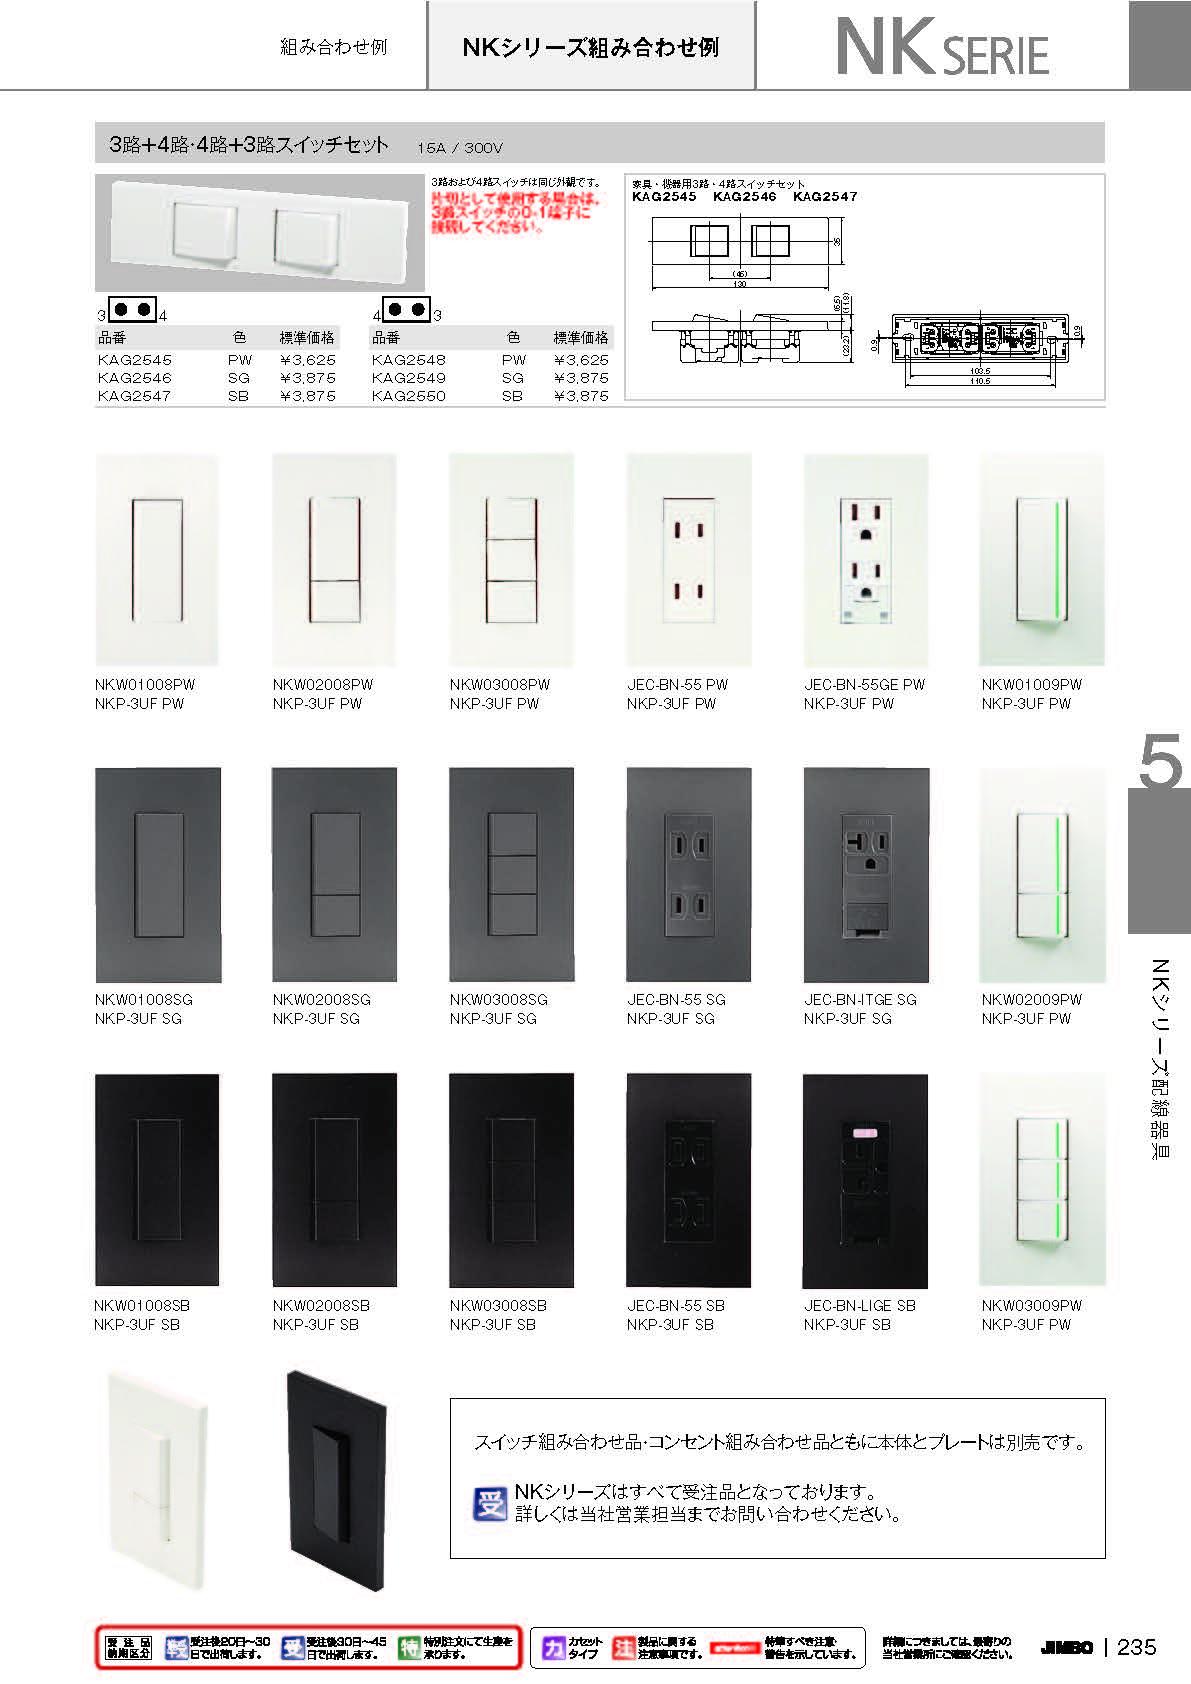 JIMBO(神保電器) 商品名: NKシリーズ配線器具